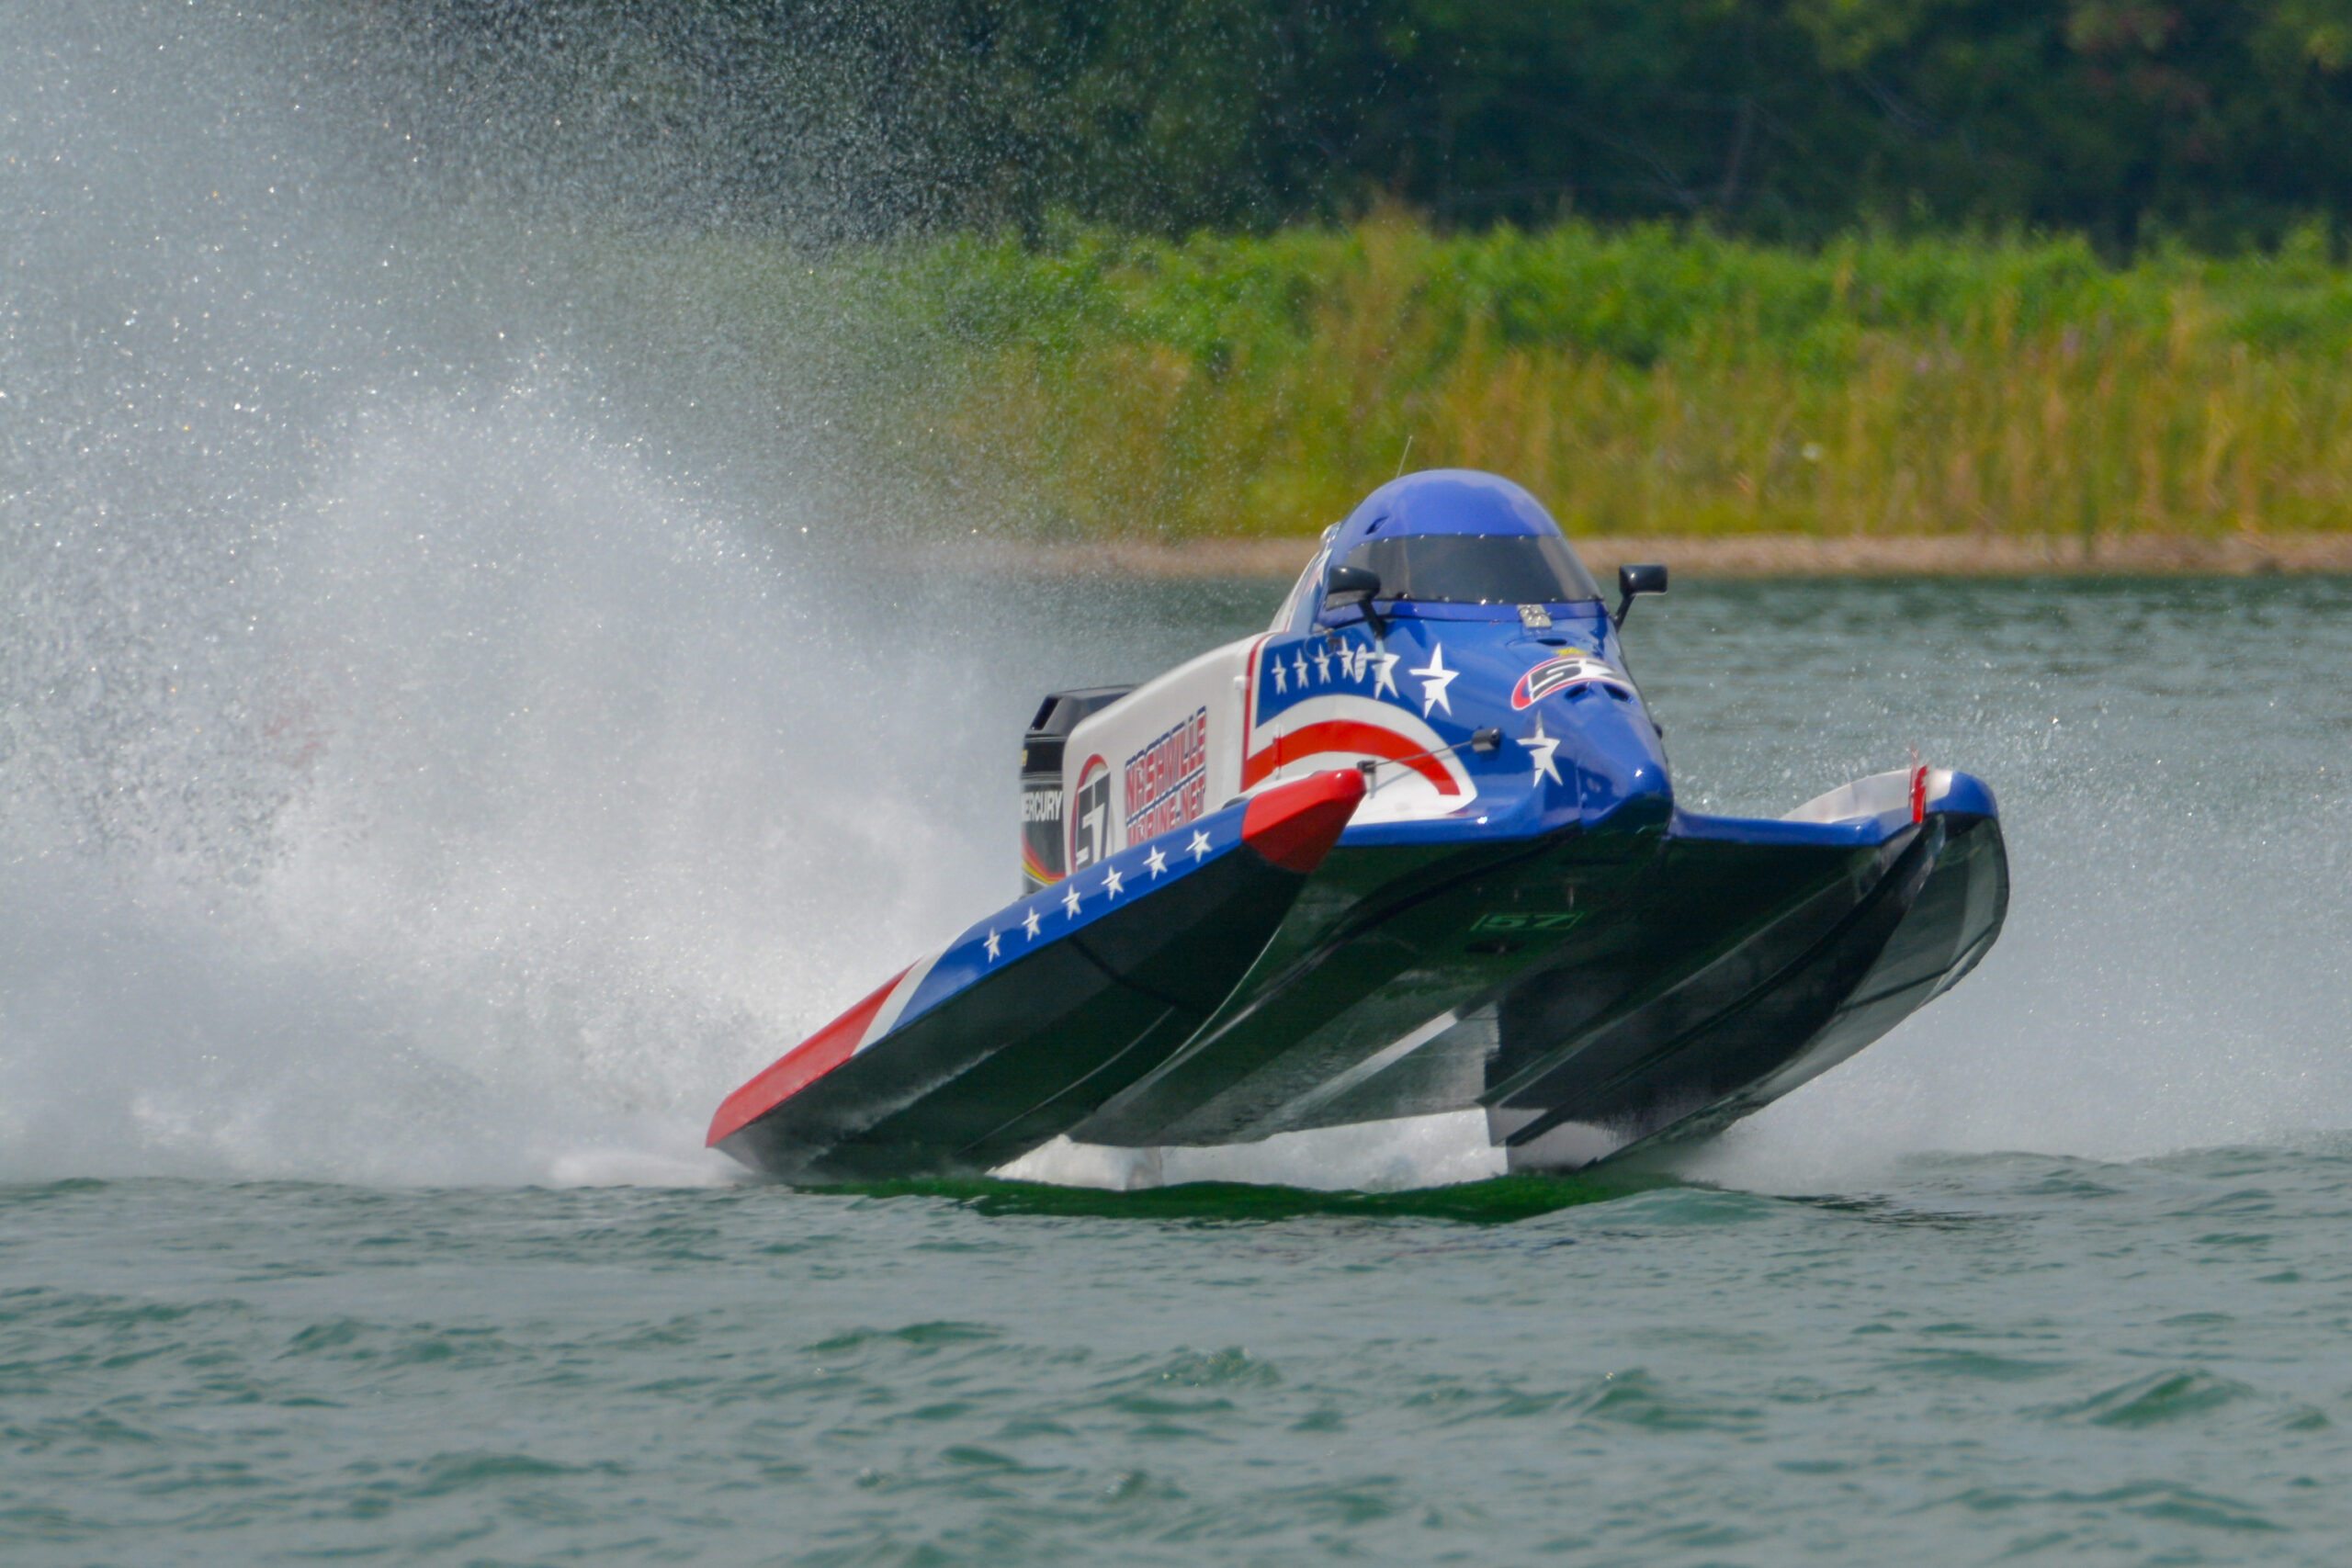 McMurray Racing Nashville Marine 2021 Springfield F1 Race-18